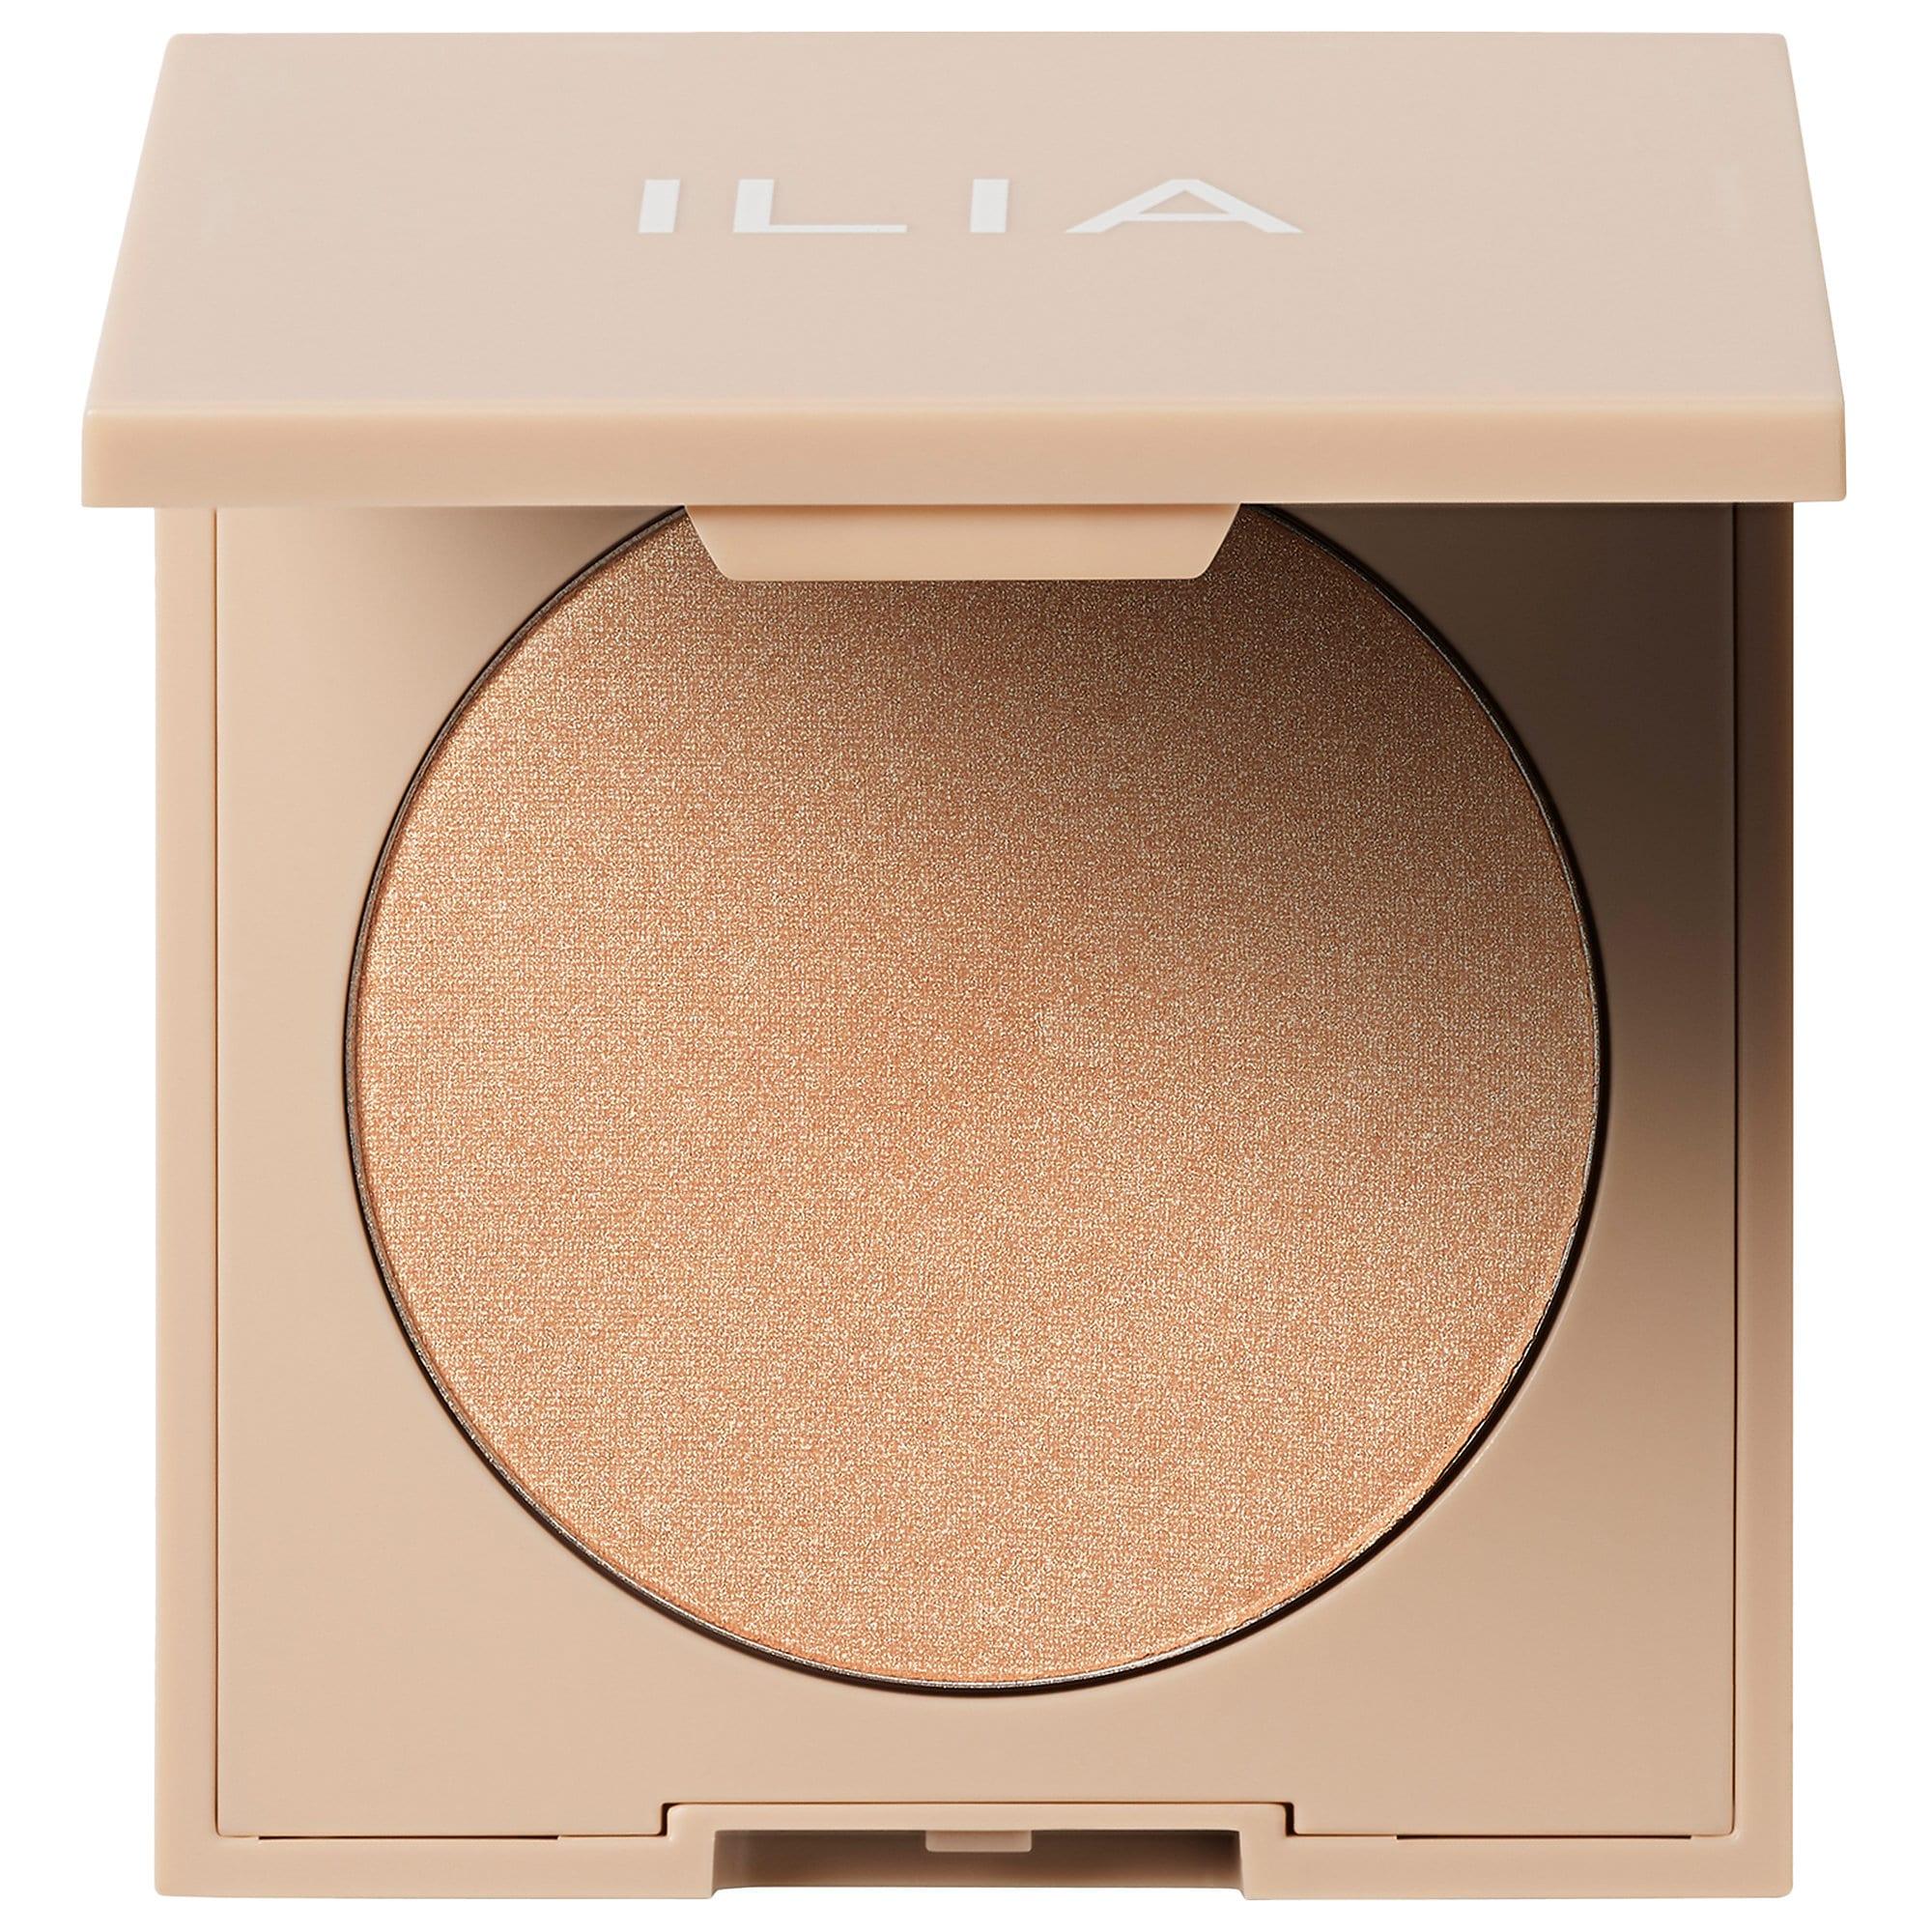 Ilia - DayLite Highlighter Powder